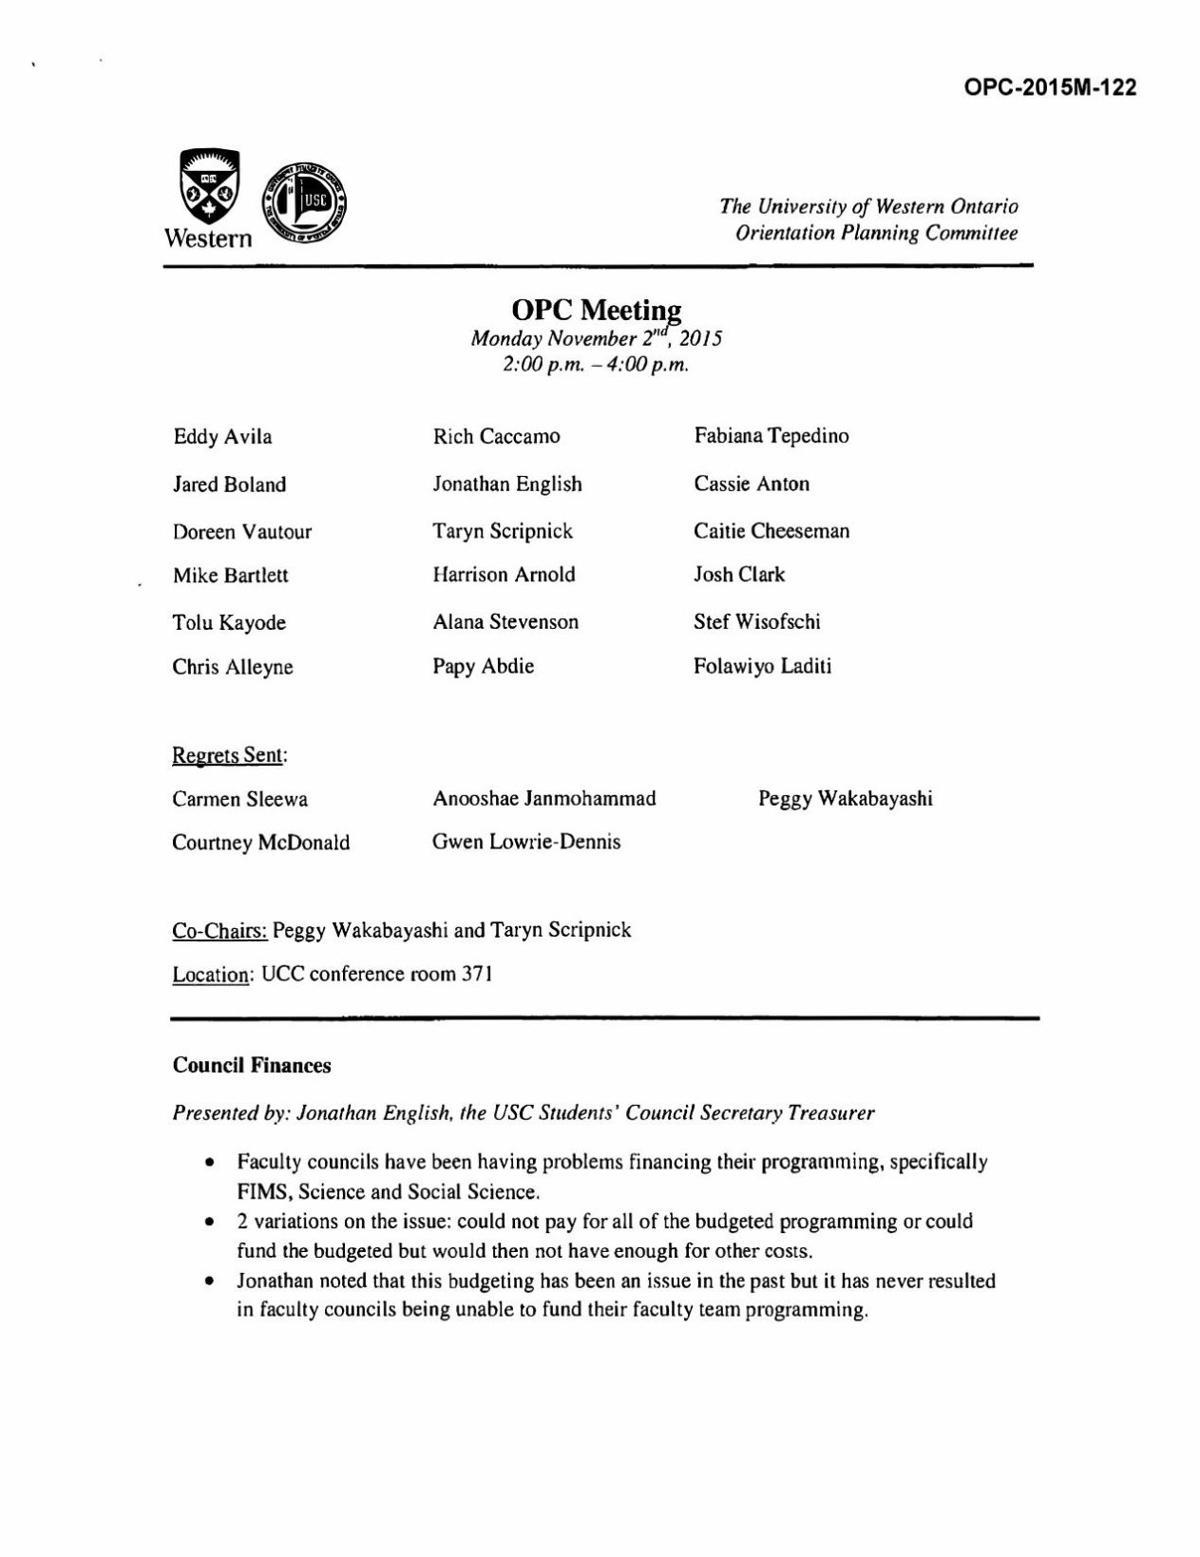 OPC Meeting - November 2, 2015.pdf